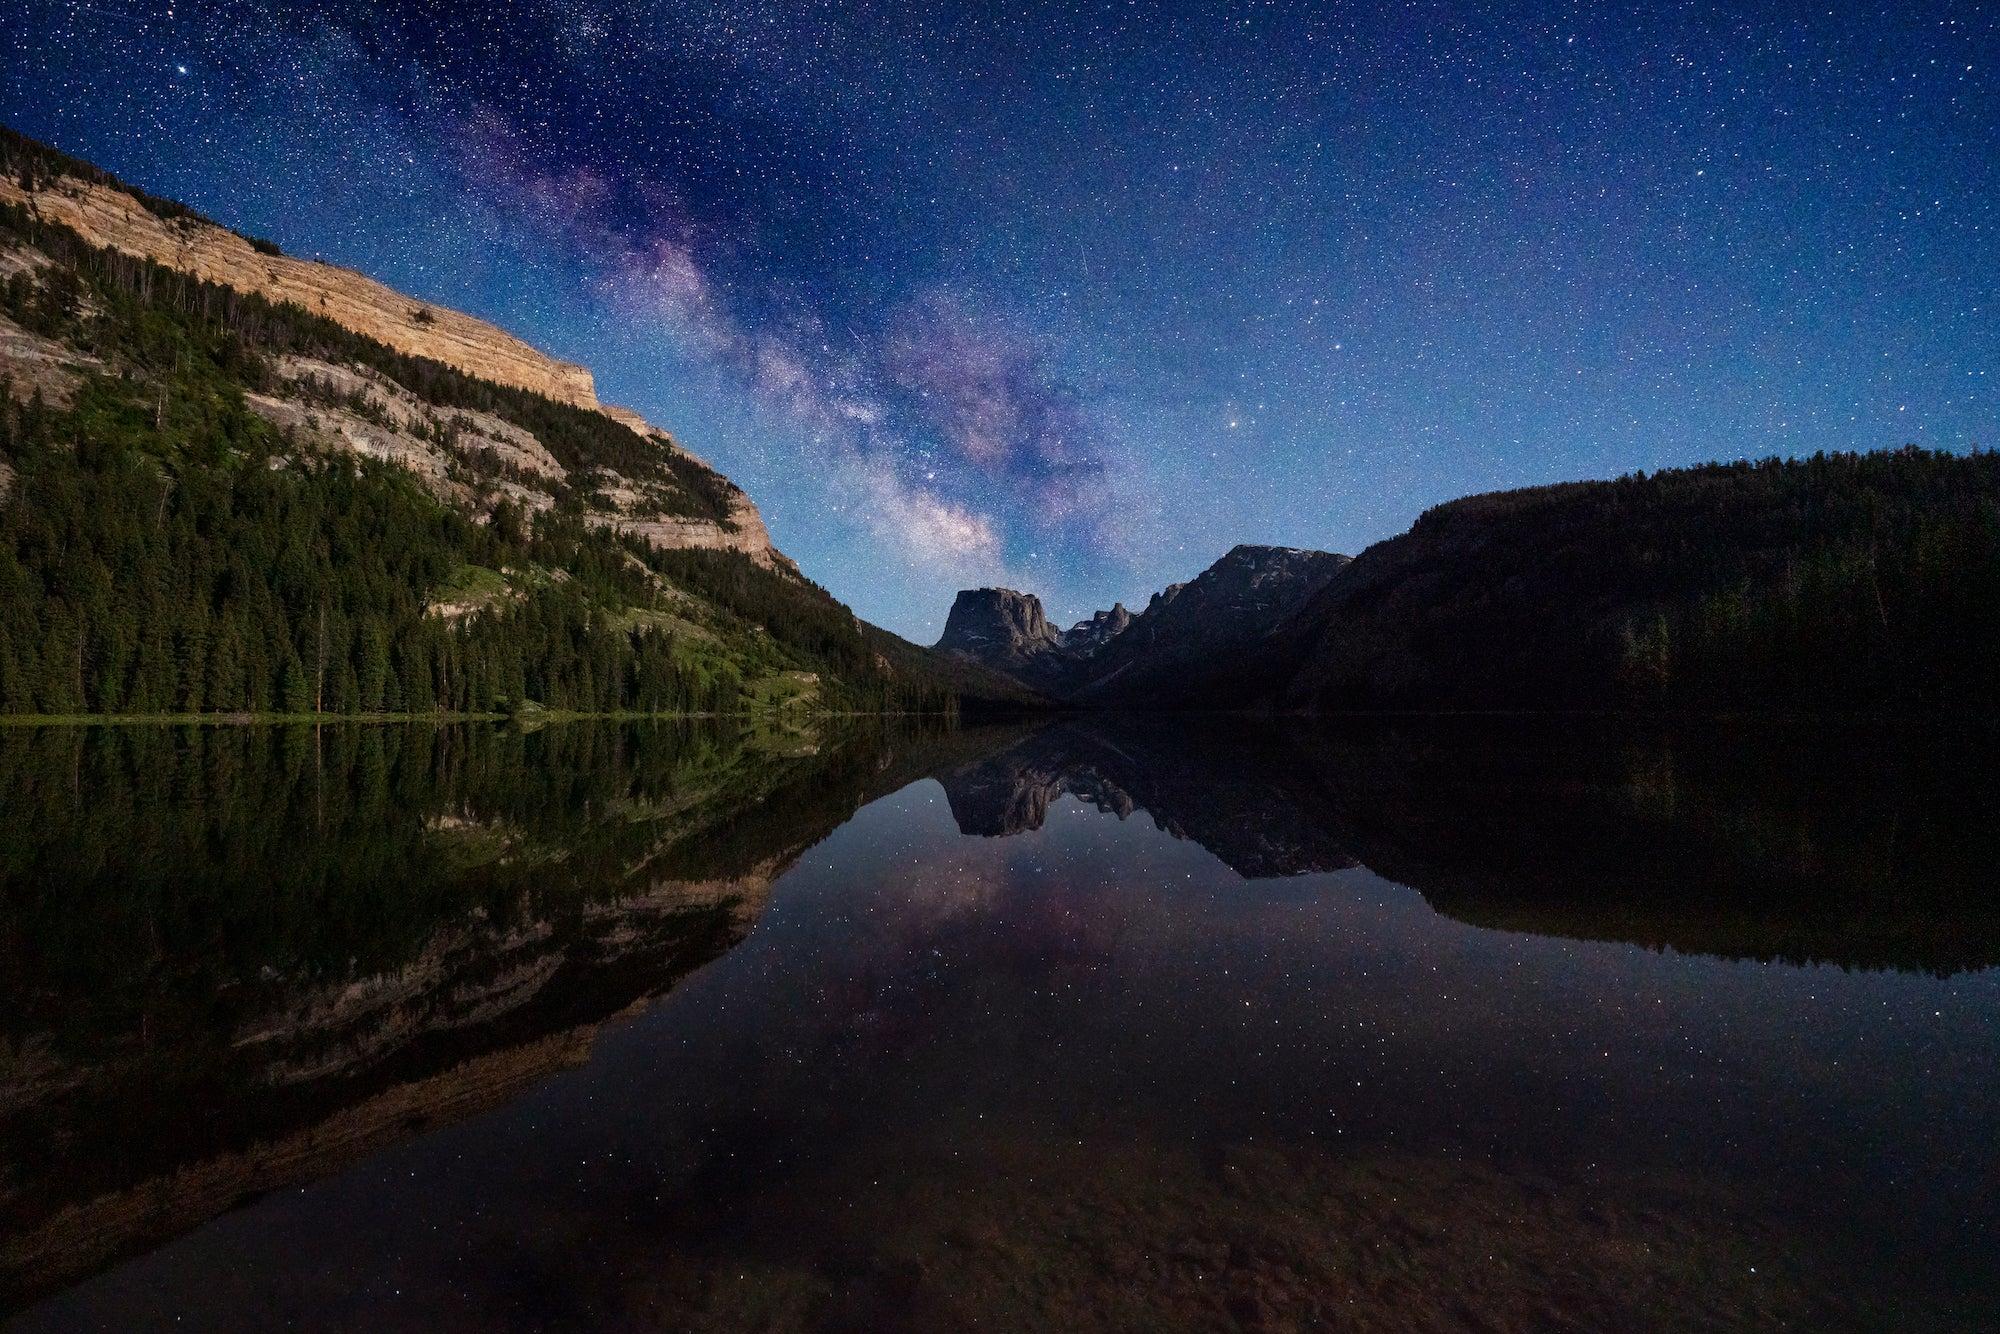 Alpha-Universe-First-Shots-Autumn-Schrock-astro-landscape.jpg